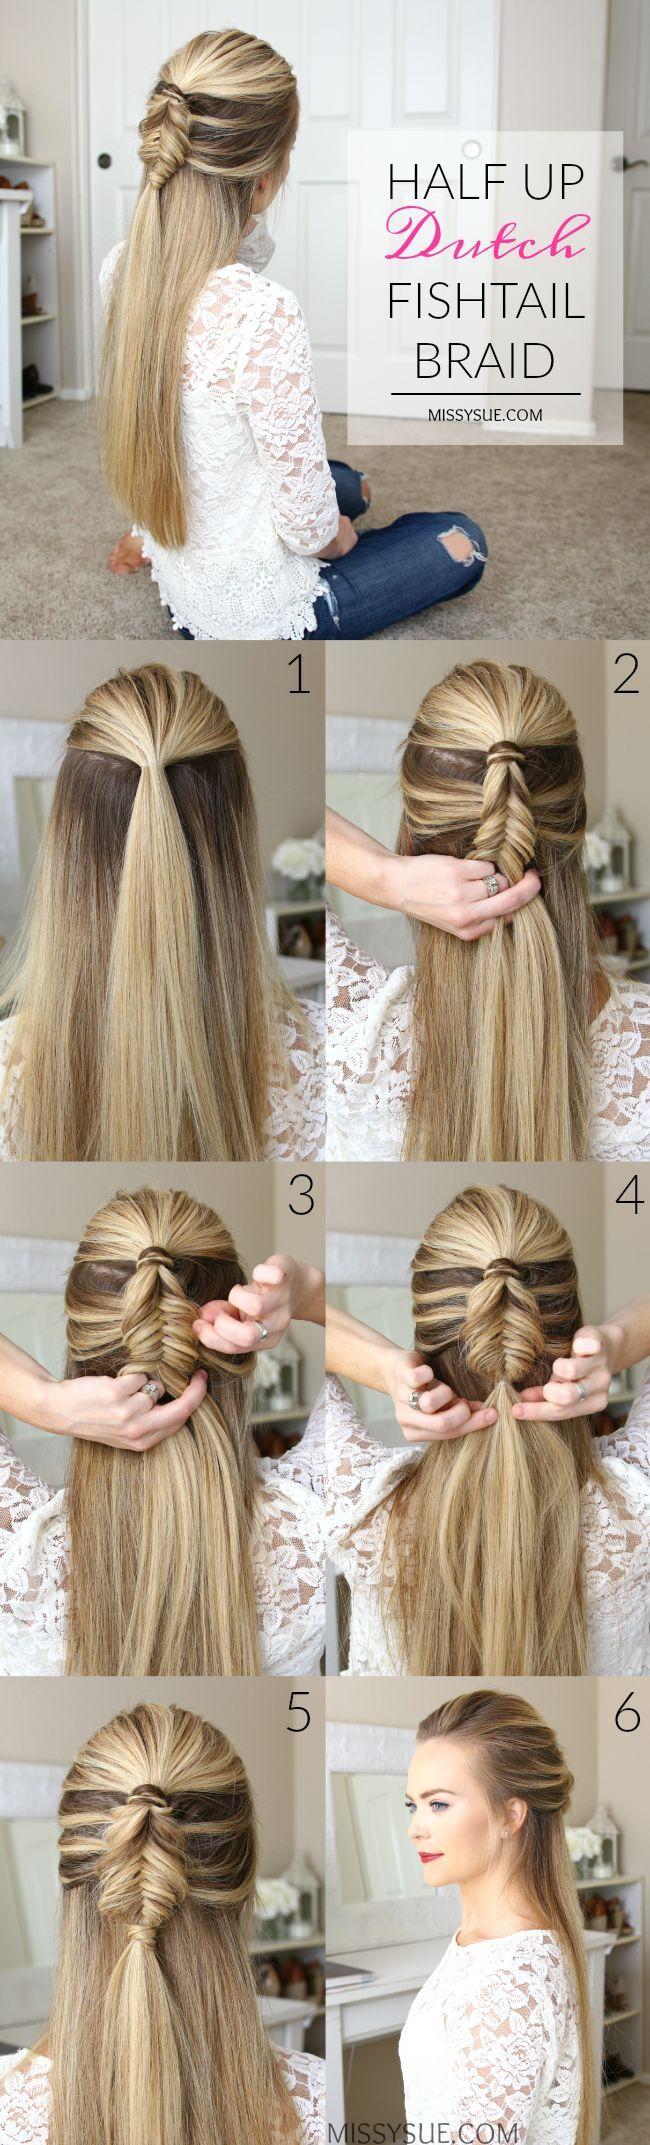 nice half-up-dutch-fishtail-braid-hairstyle-tutorial... by http://www.dana-hairstyles.xyz/hair-tutorials/half-up-dutch-fishtail-braid-hairstyle-tutorial/